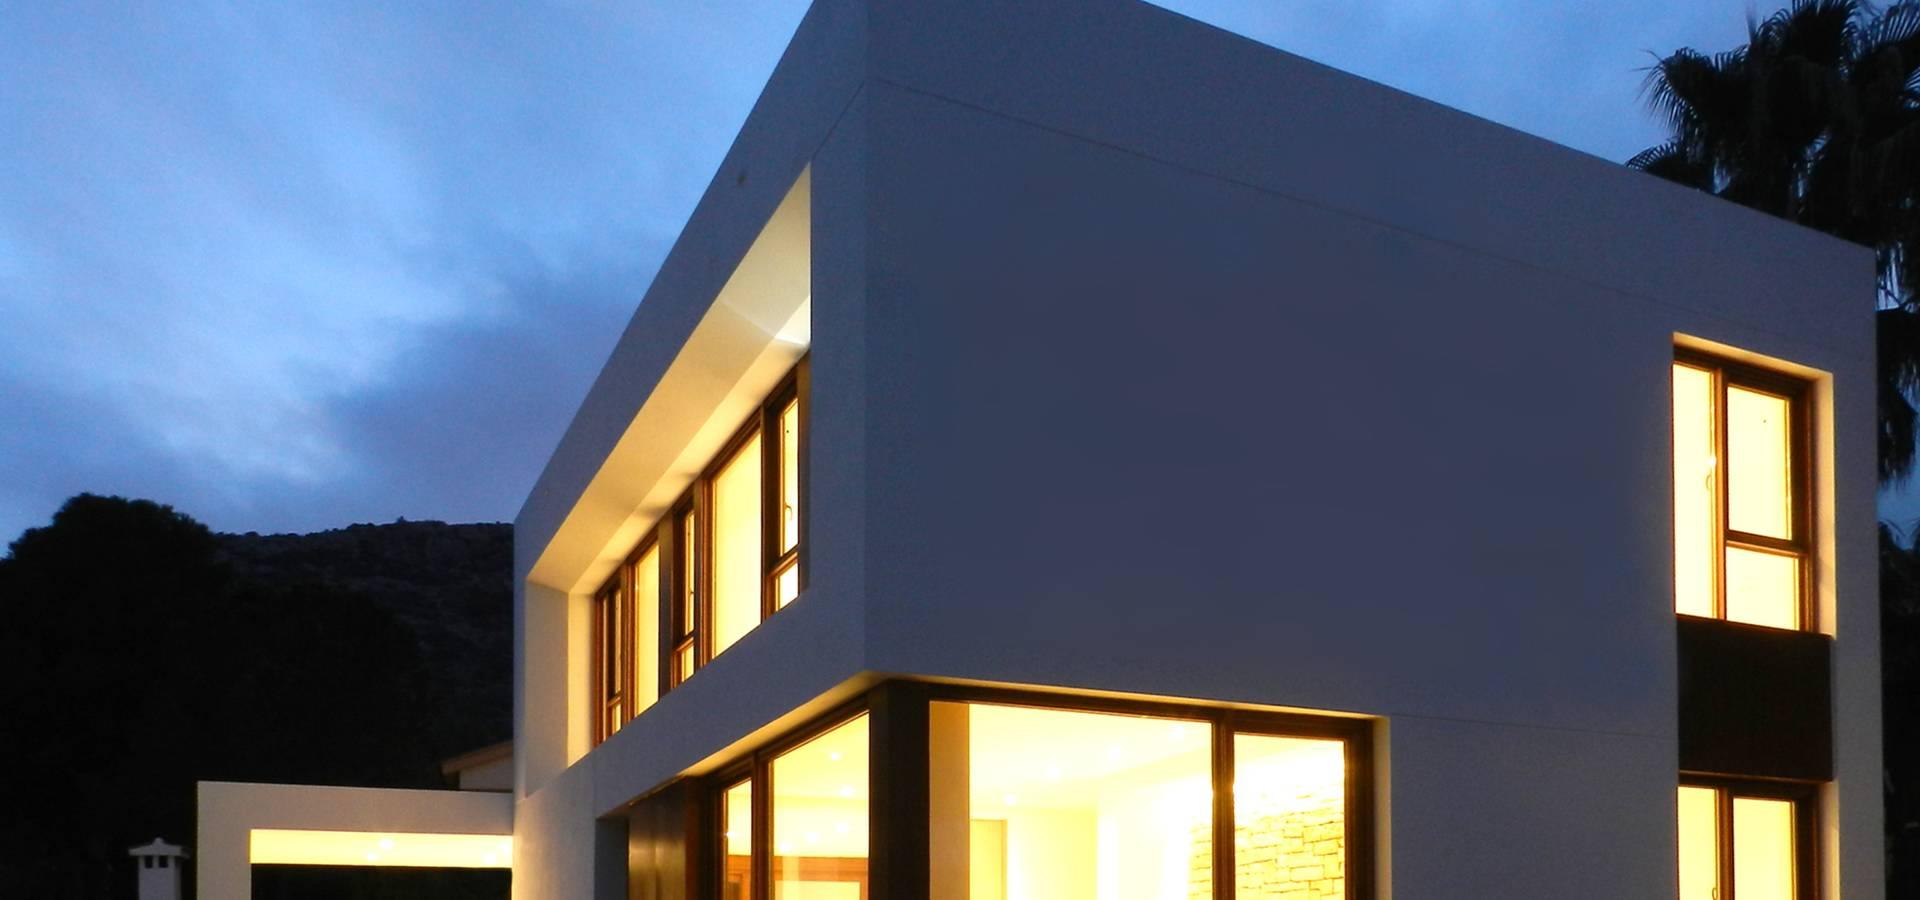 gmg arquitectos